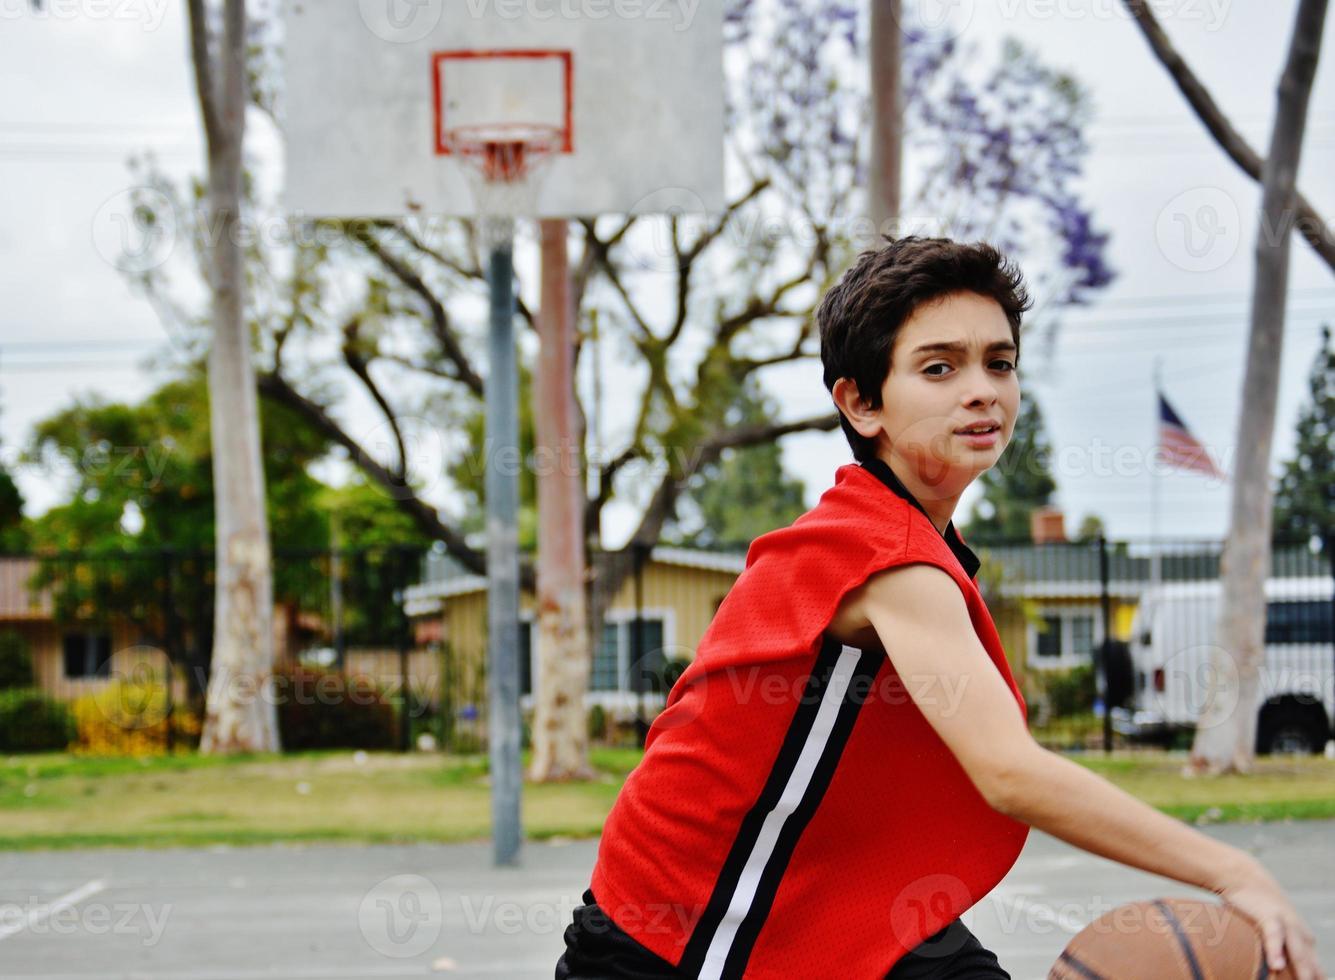 Junge spielt Basketball foto